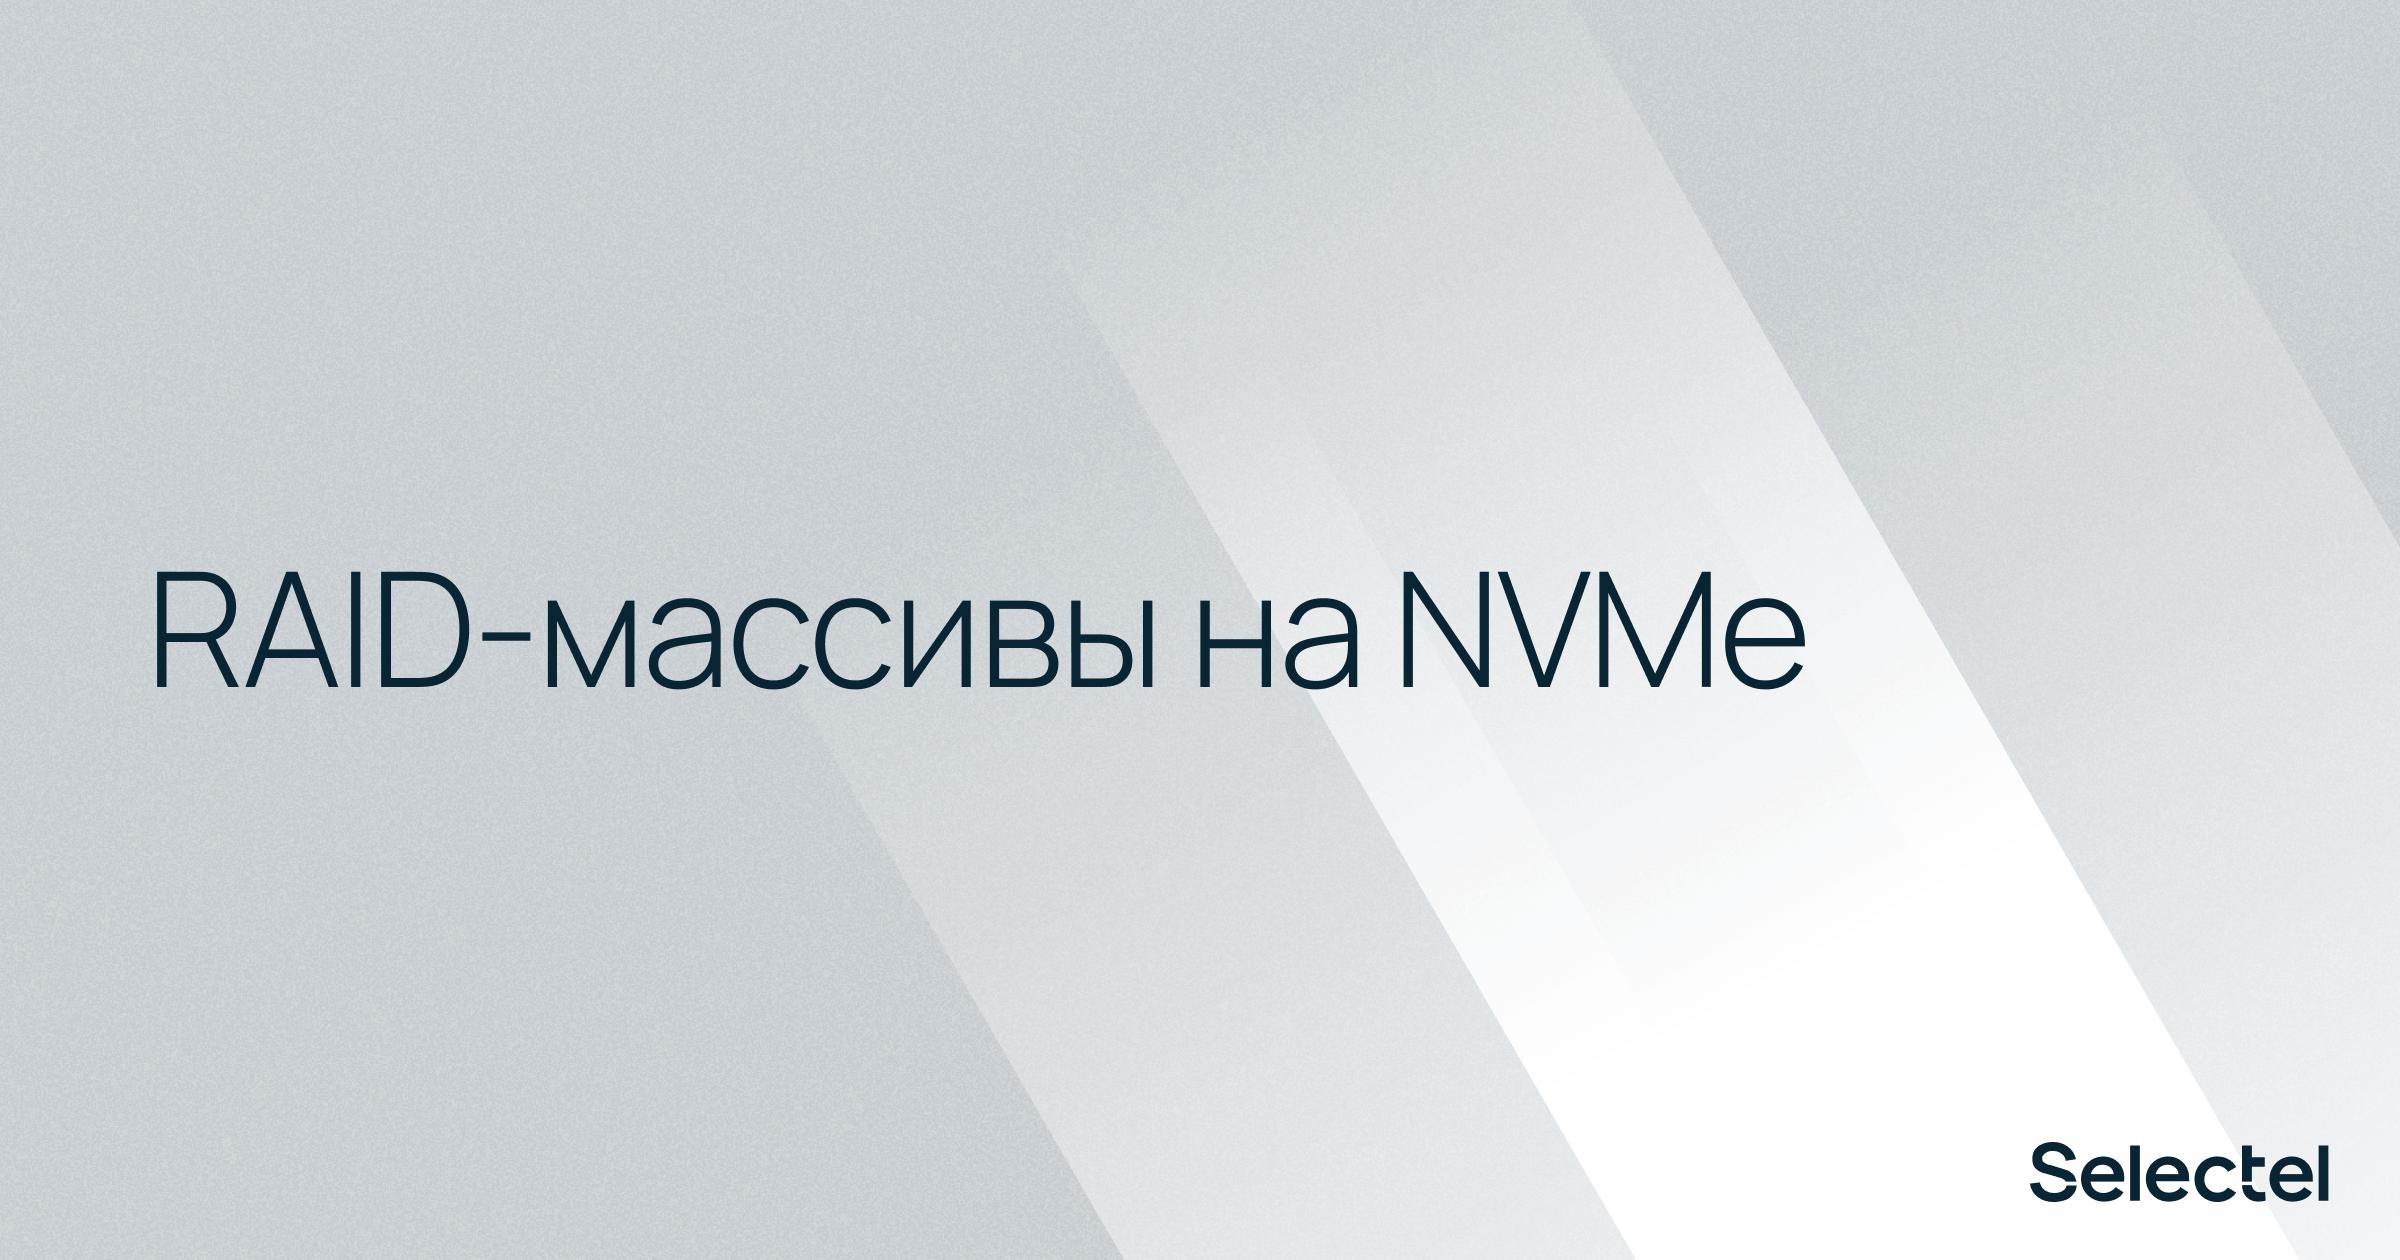 RAID-массивы на NVMe